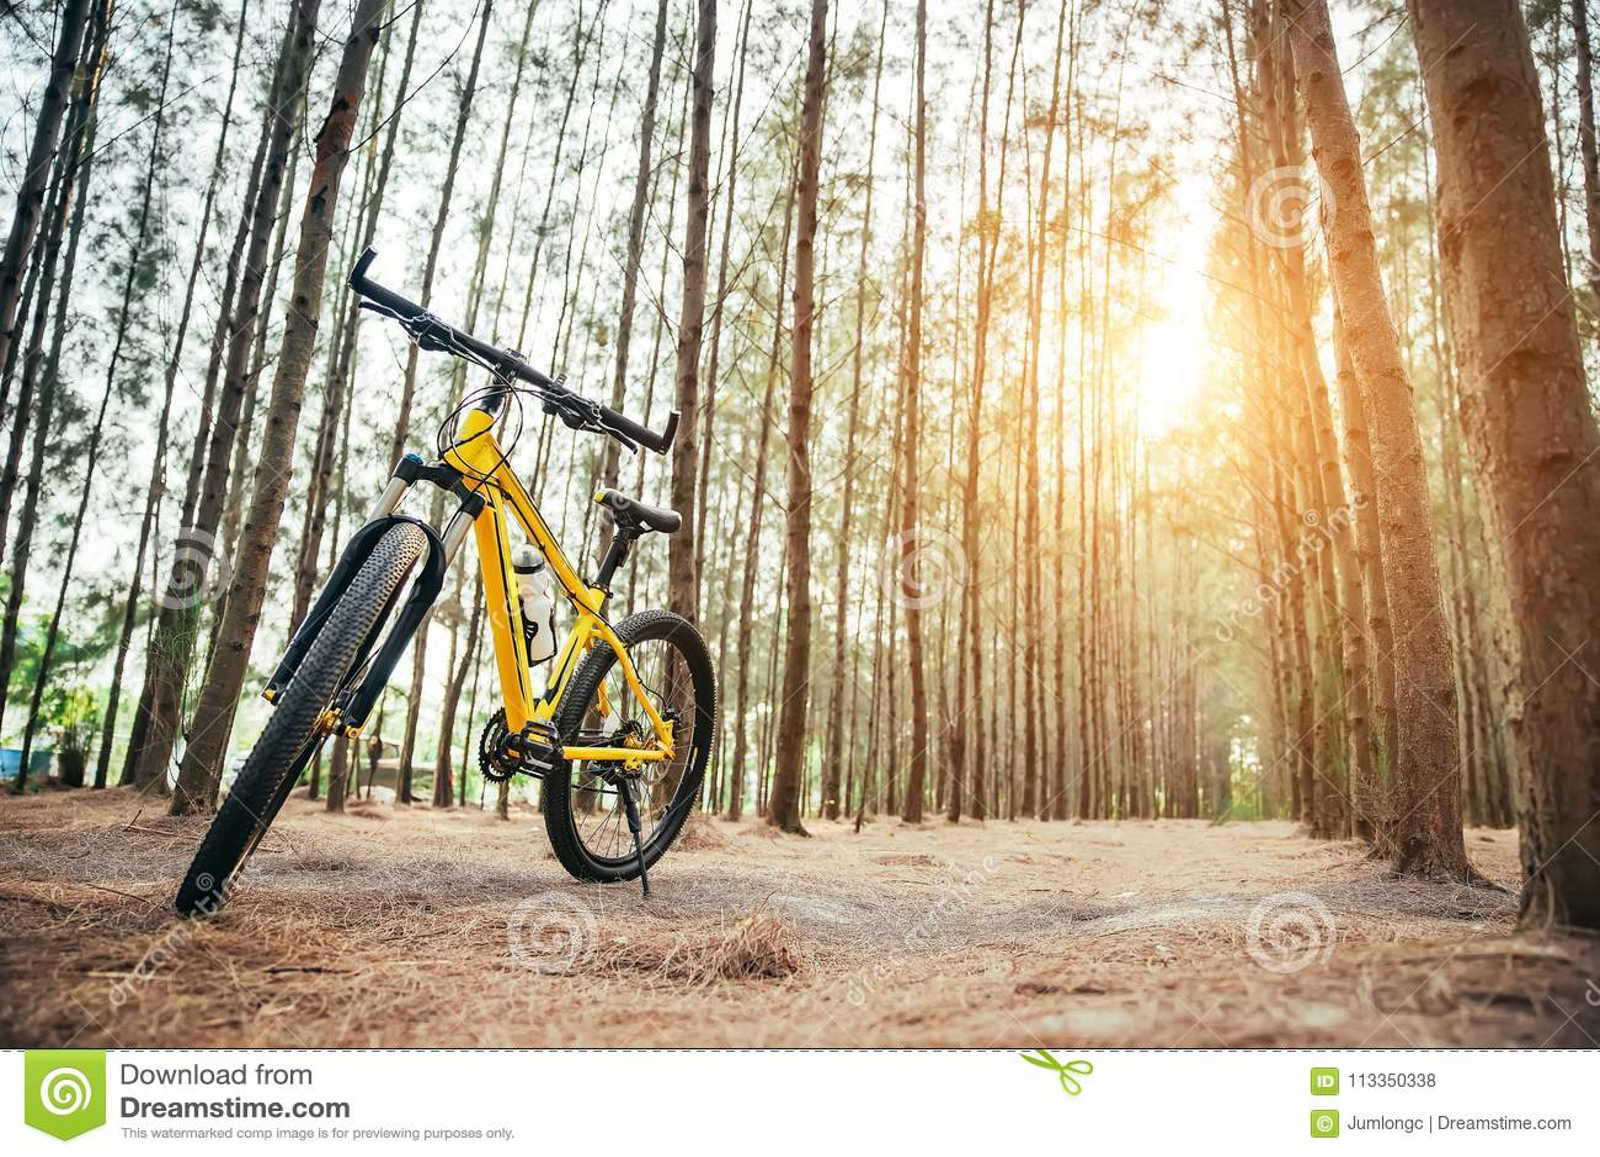 A yellow MTB bicycle along